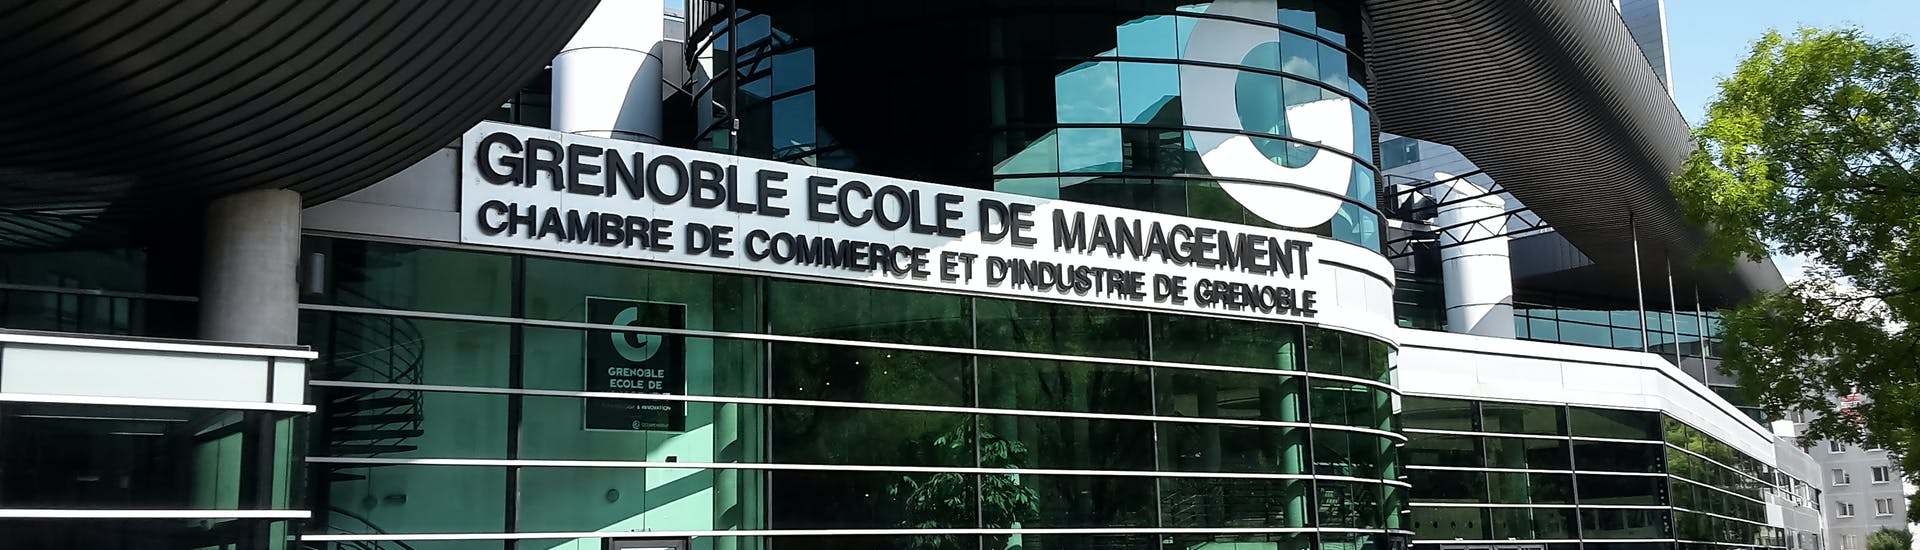 Fashion Design And Luxury Management M Sc Grenoble Ecole De Management Grenoble France Mastersportal Com